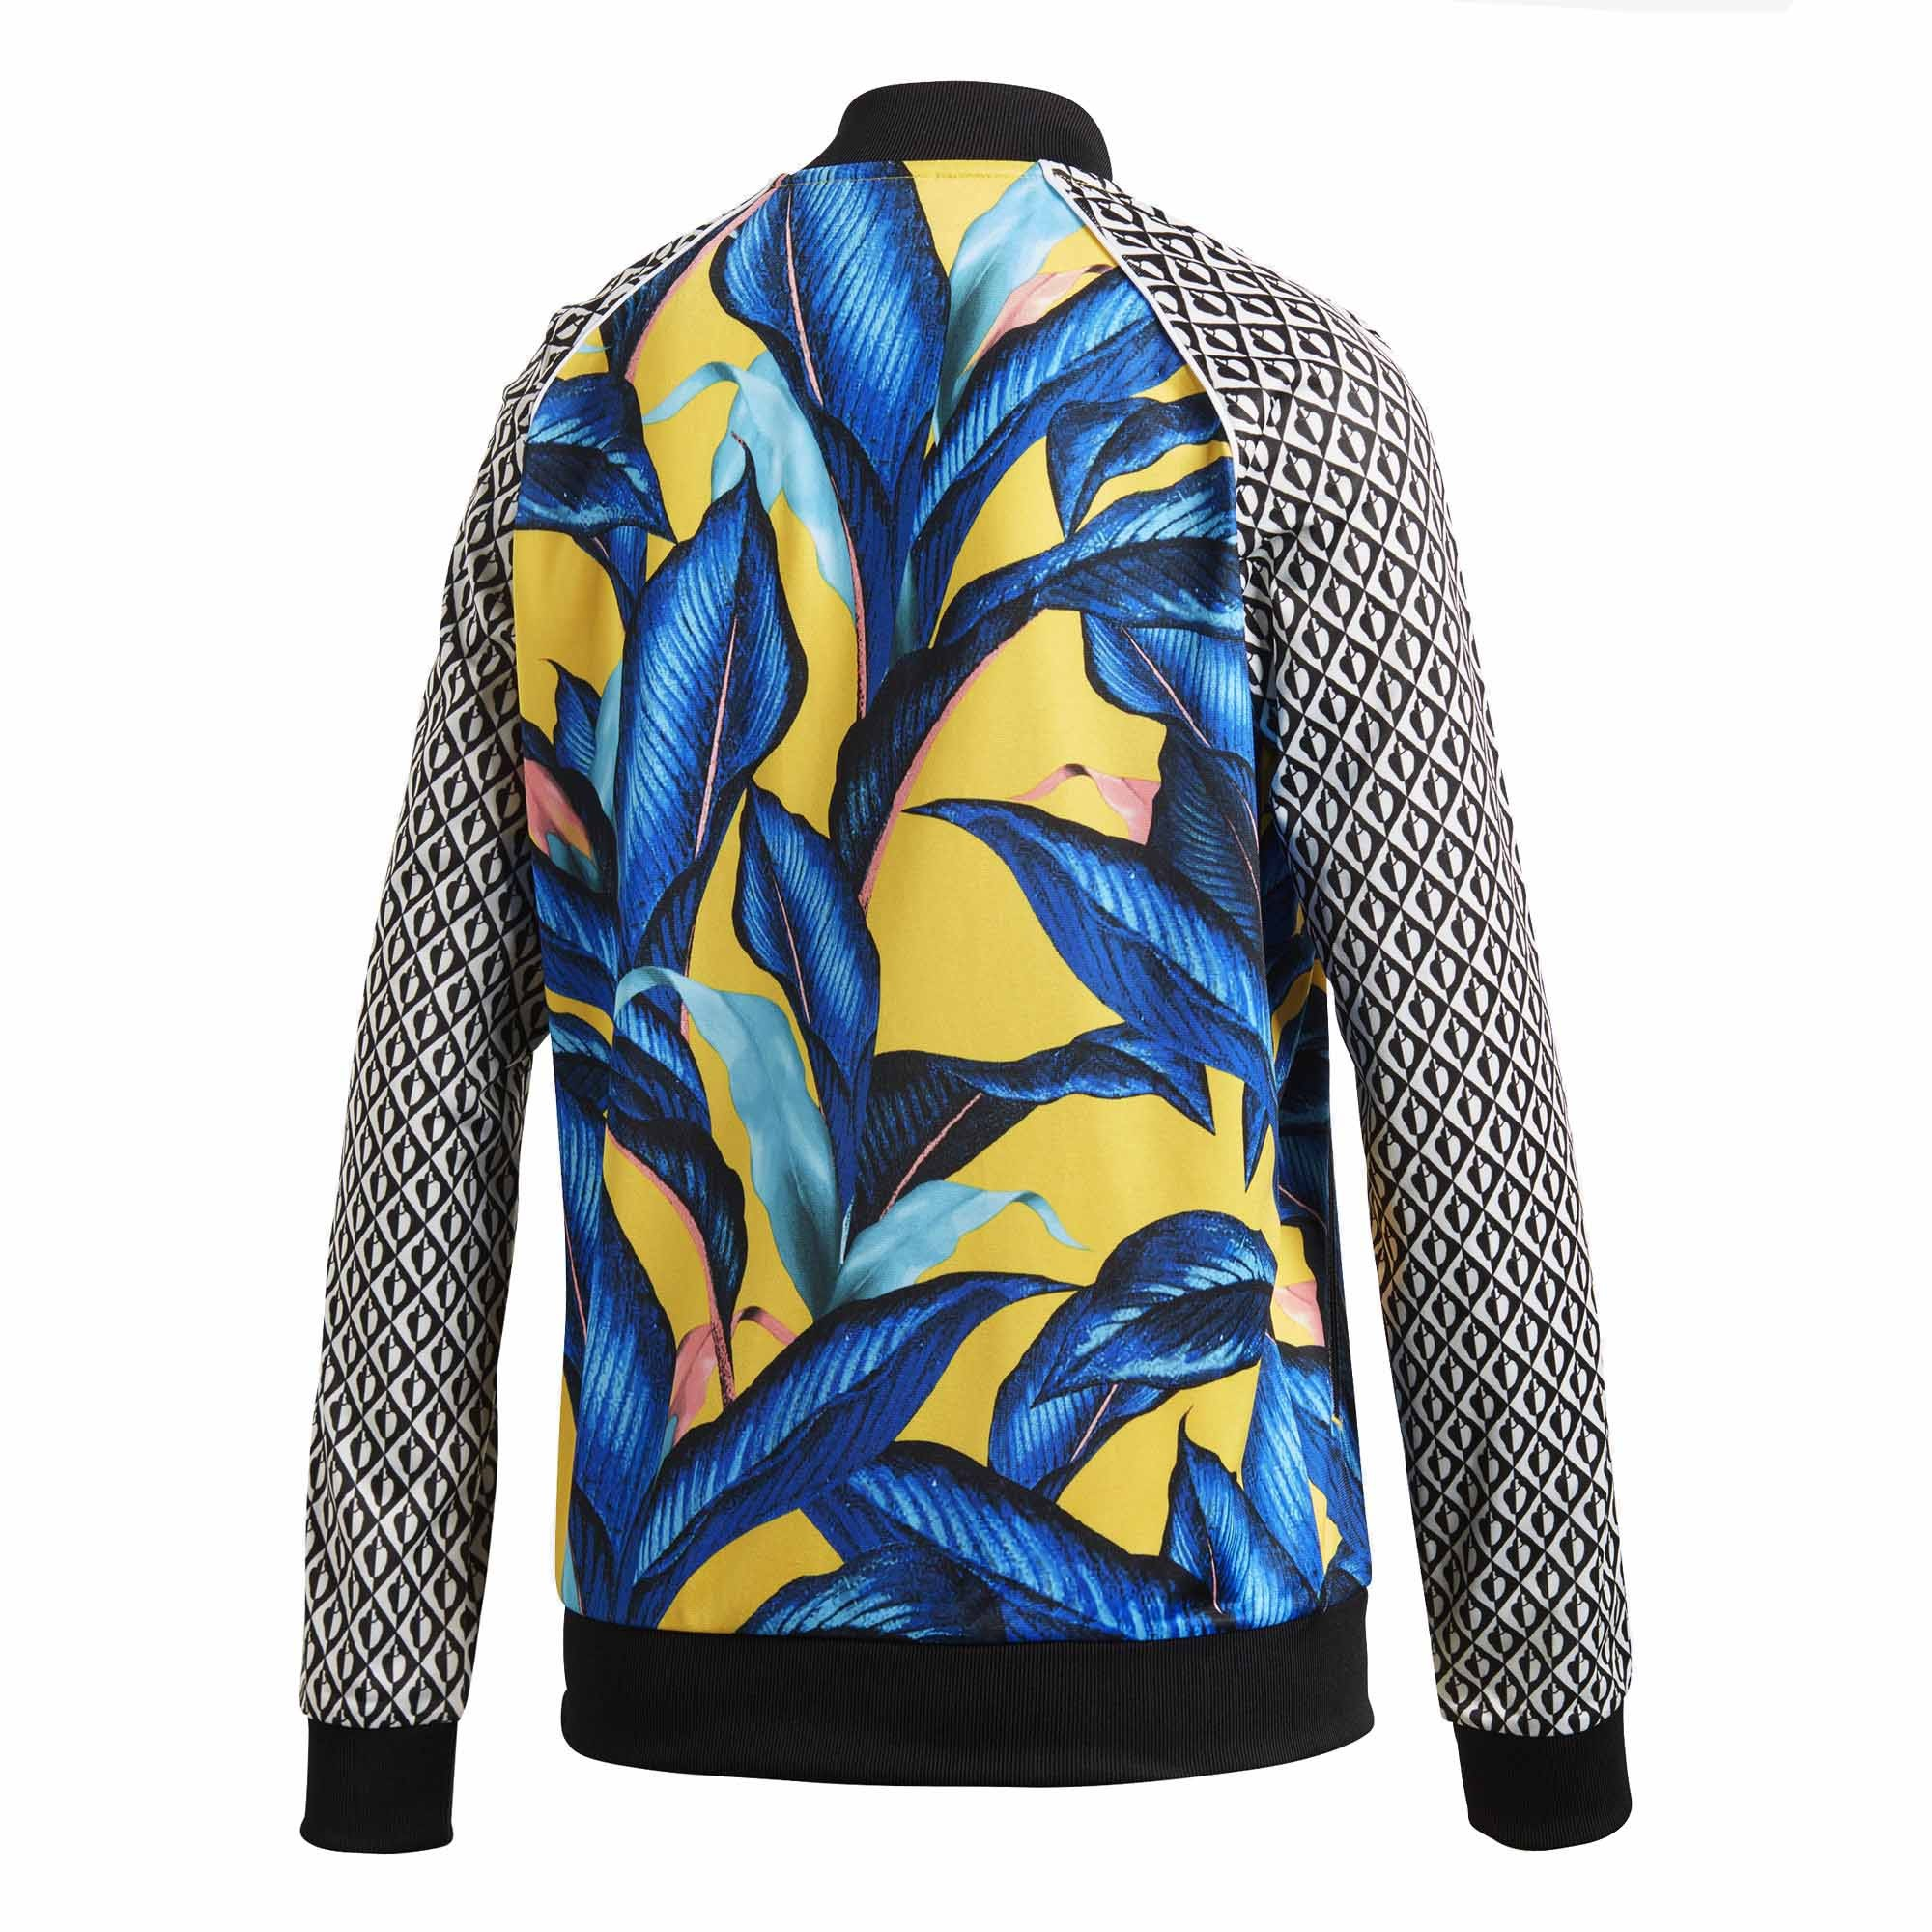 62936d23c9 Campera Adidas Originals Estampada Negro/Azul/Amarillo Dama Deporfan -  Indumentaria - Mujeres - E-Shop